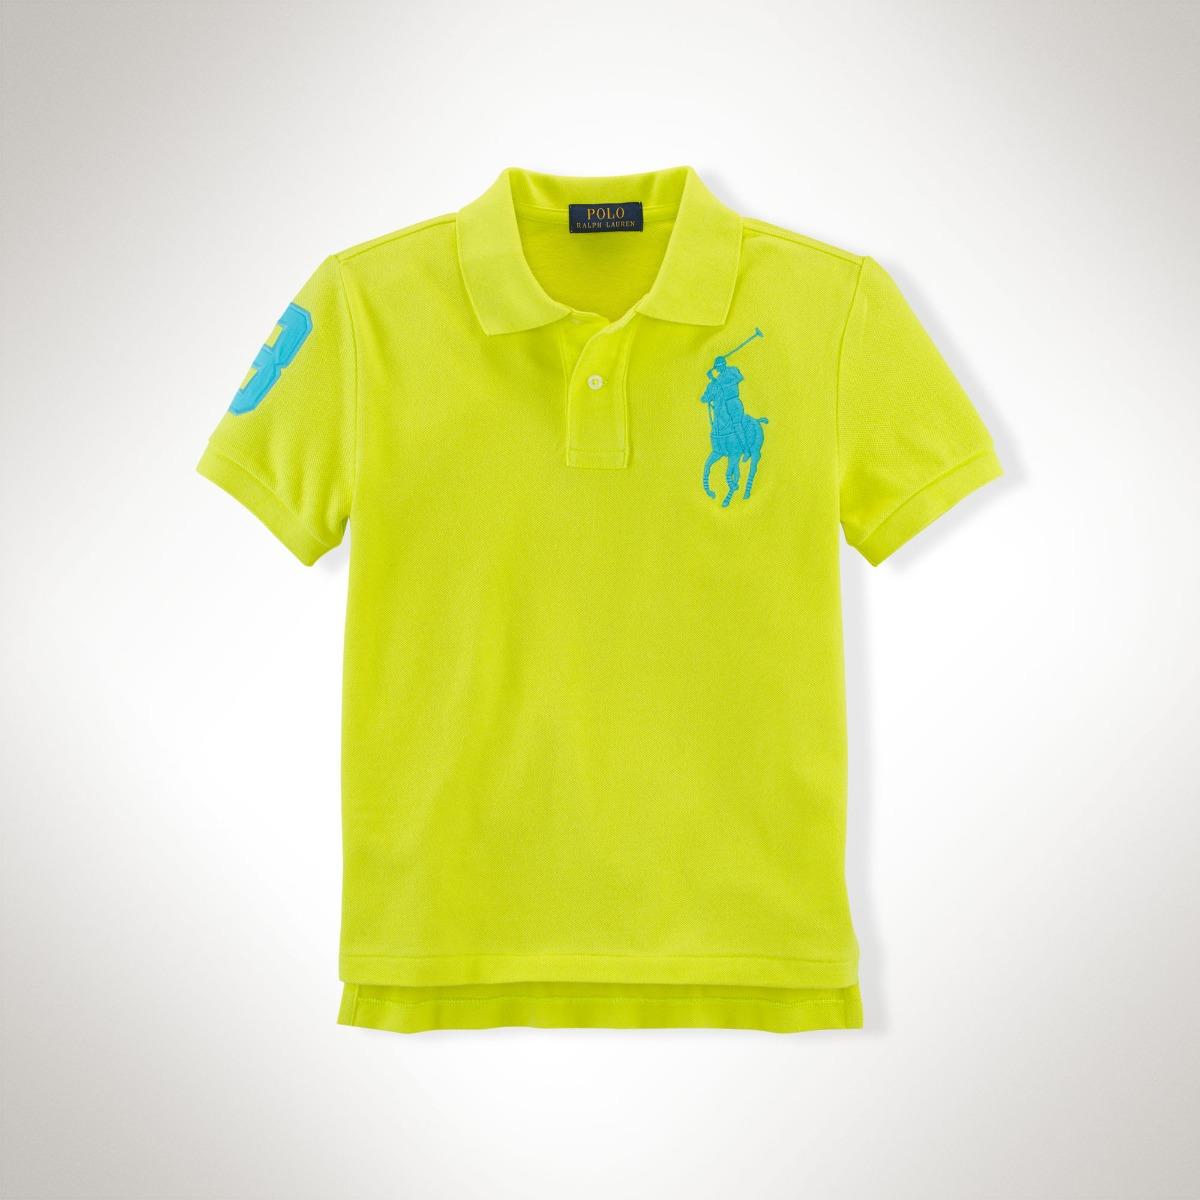 5fdb65f54d Camisa Polo Ralph Lauren Original 14 - 16 Anos Tam. L - R$ 129,99 em ...